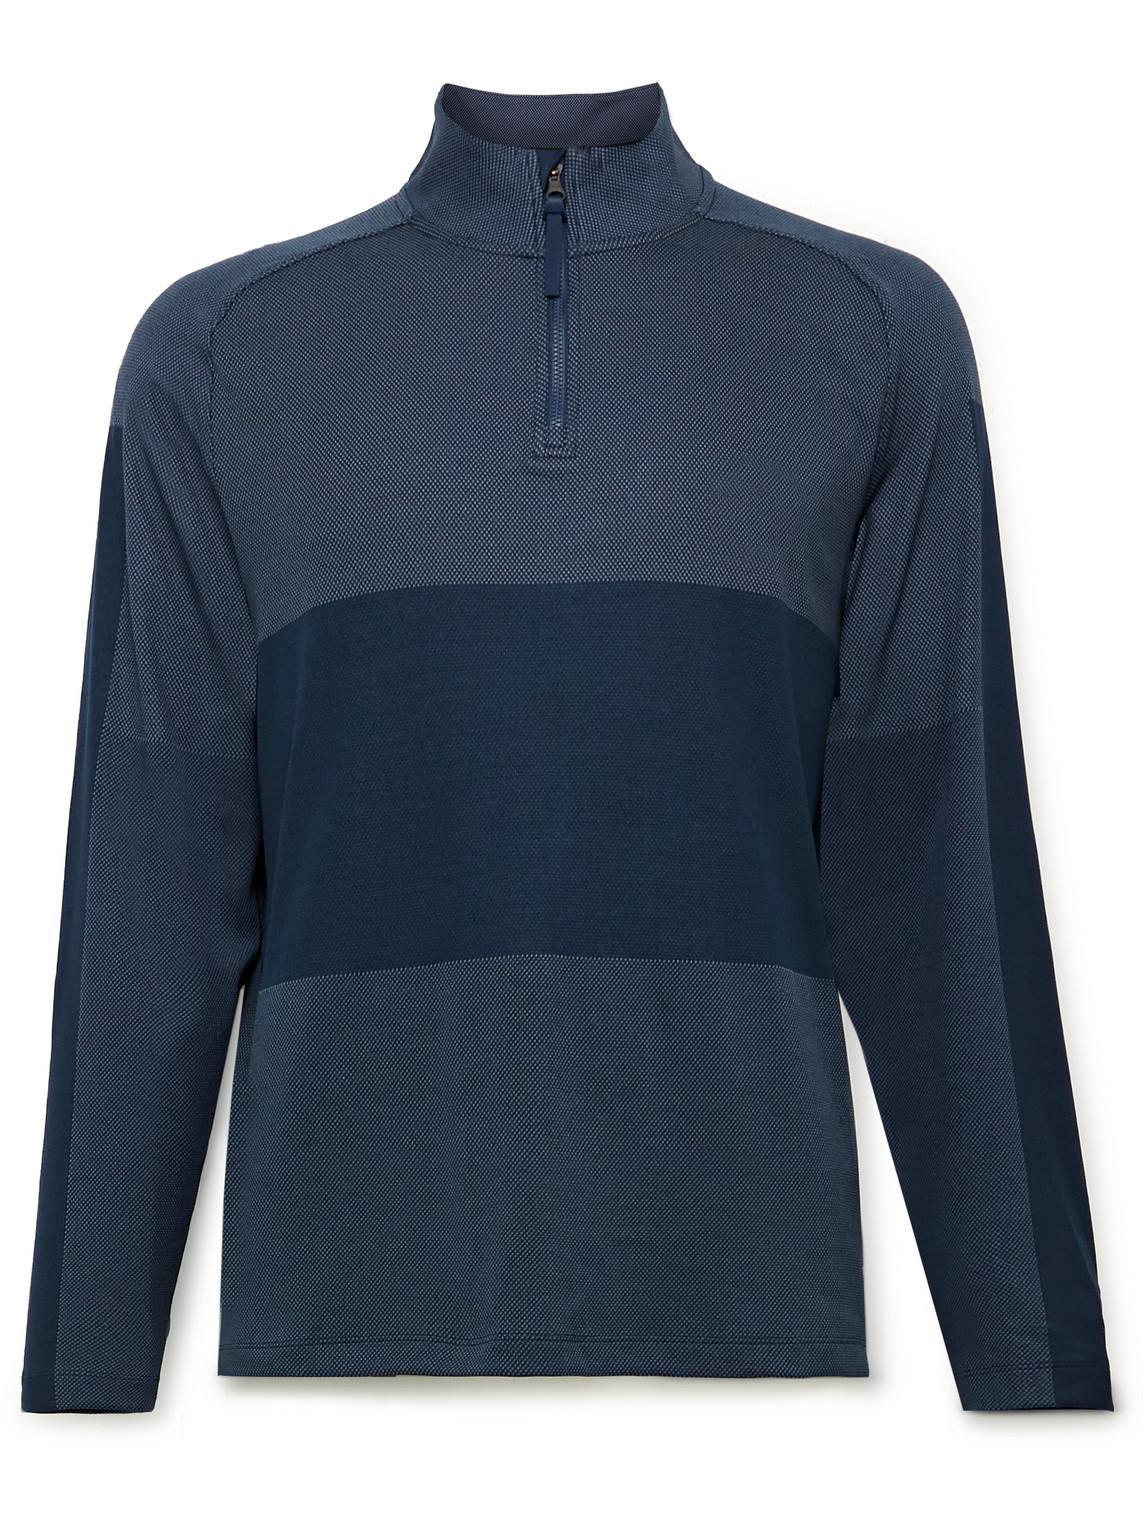 Nike Golf - Vapor Striped Dri-Fit Half-Zip Golf Top - Men - Blue - S